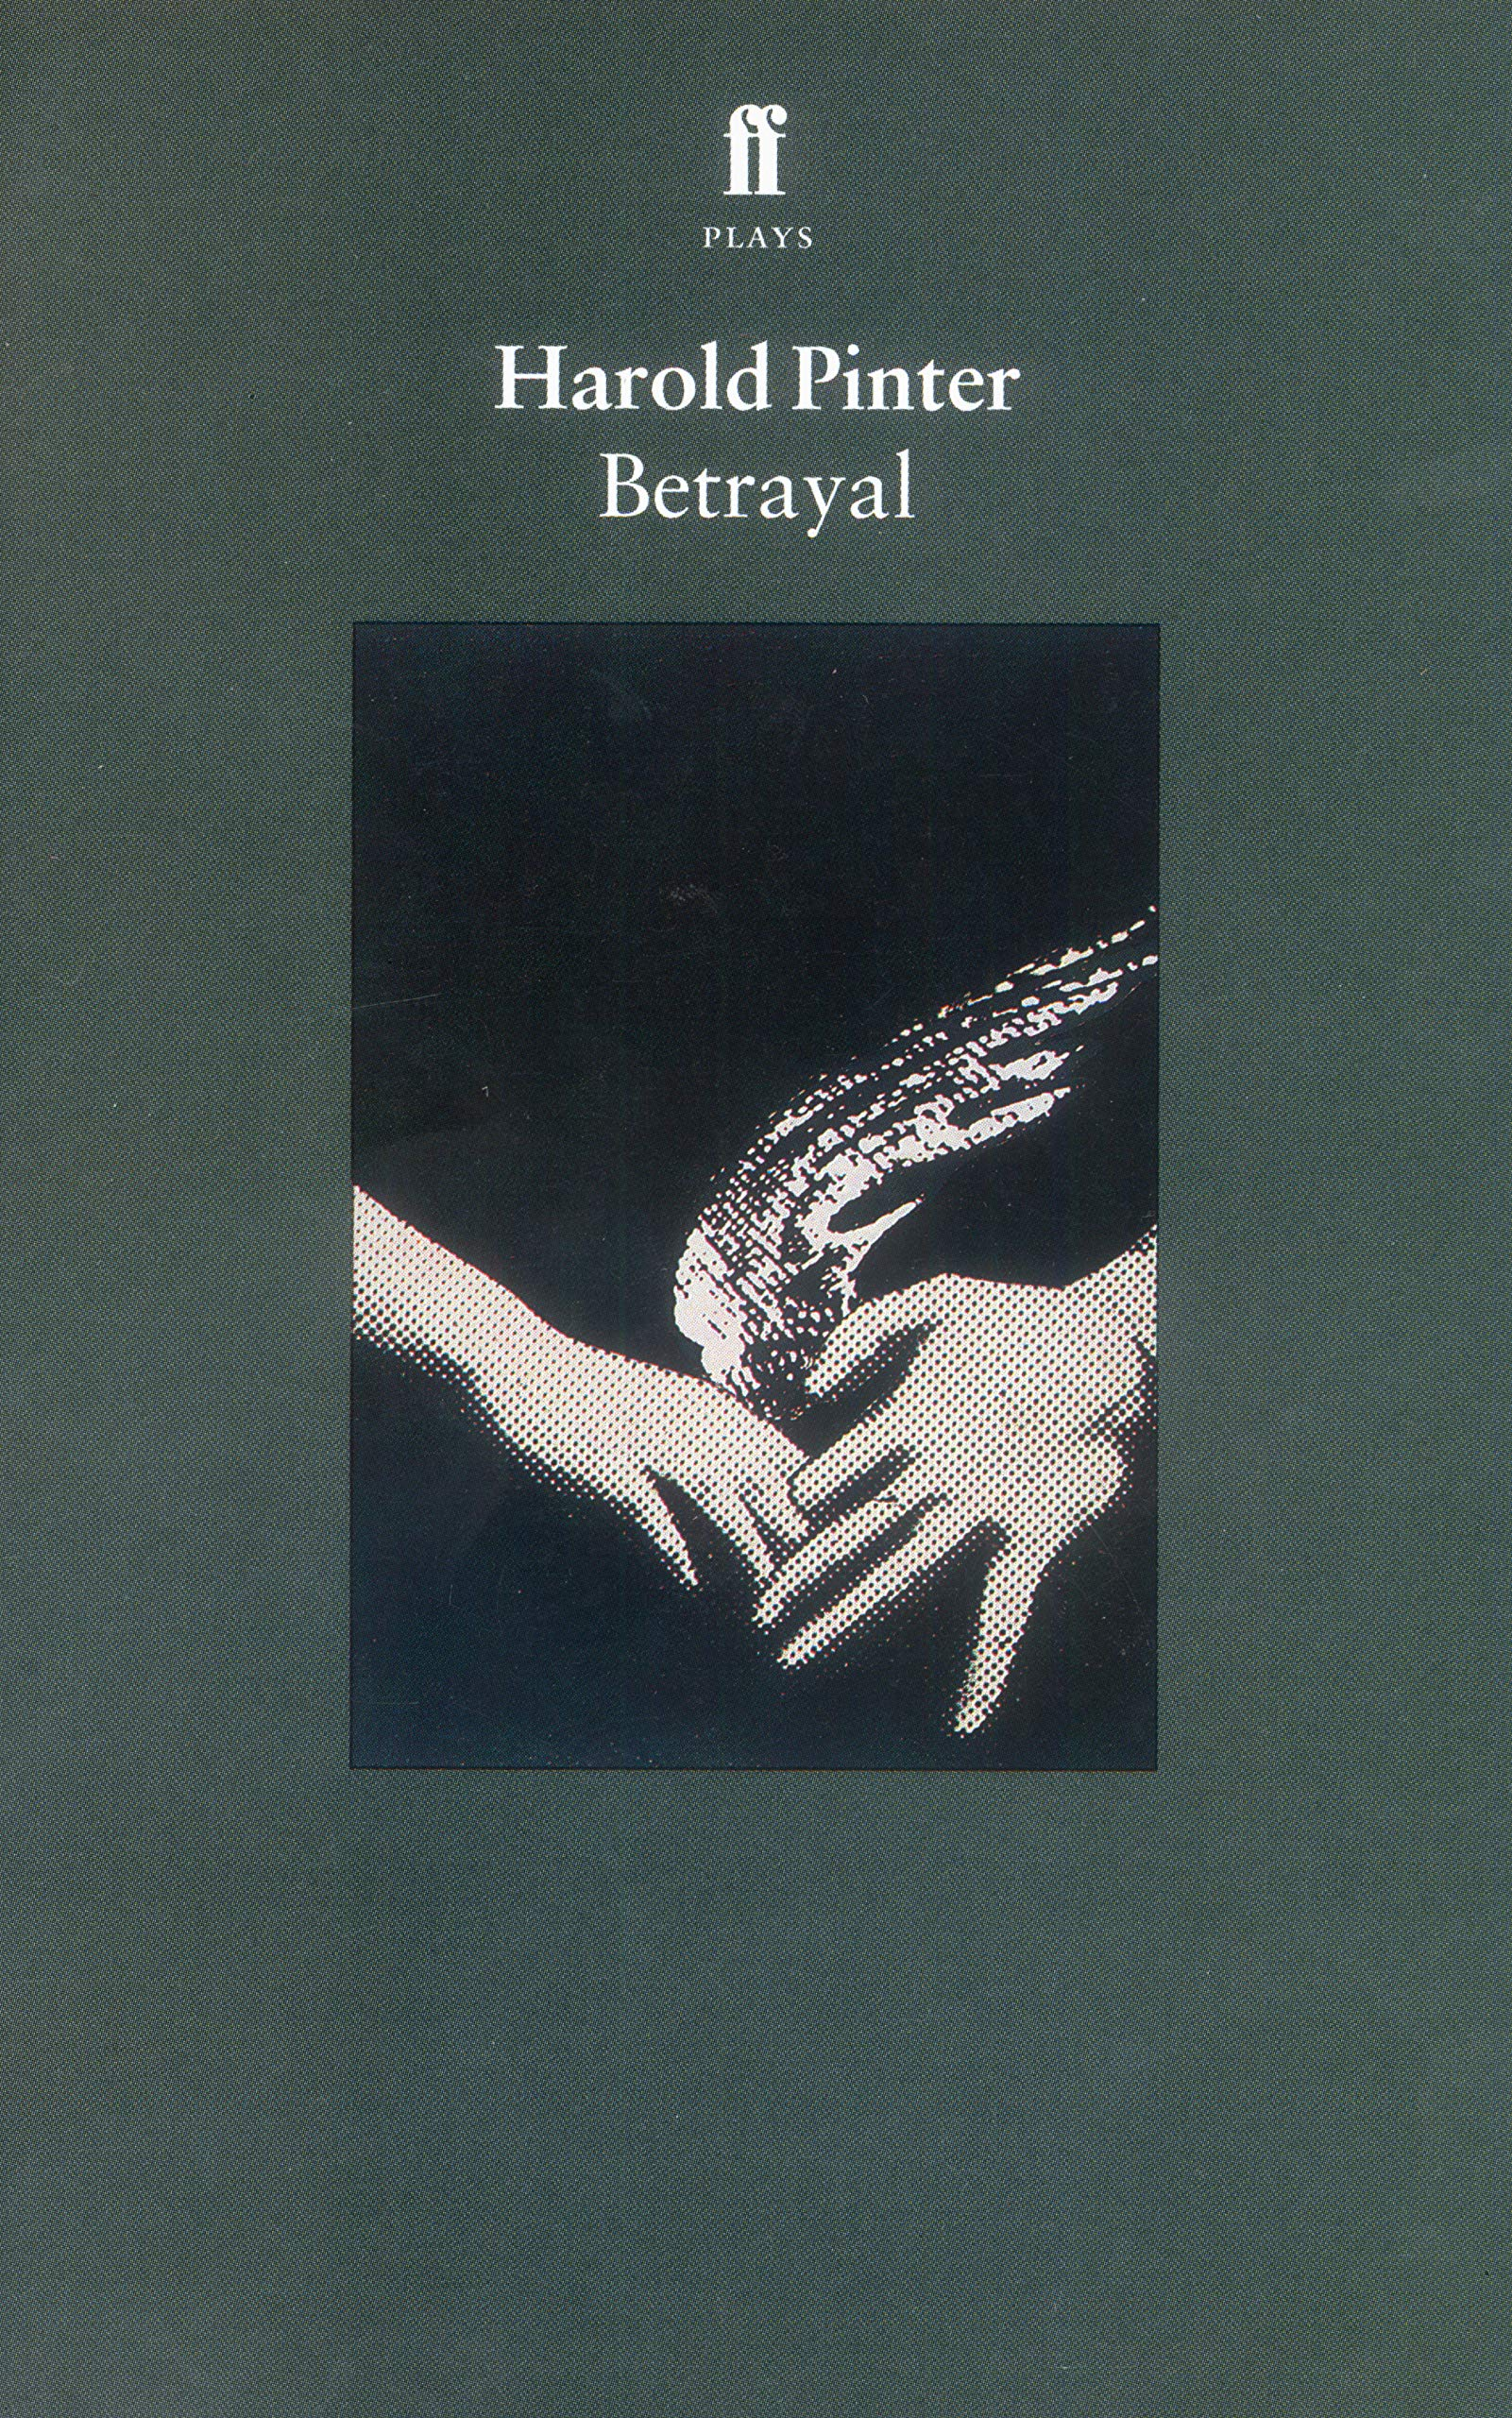 Betrayal (Donmar Warehouse)